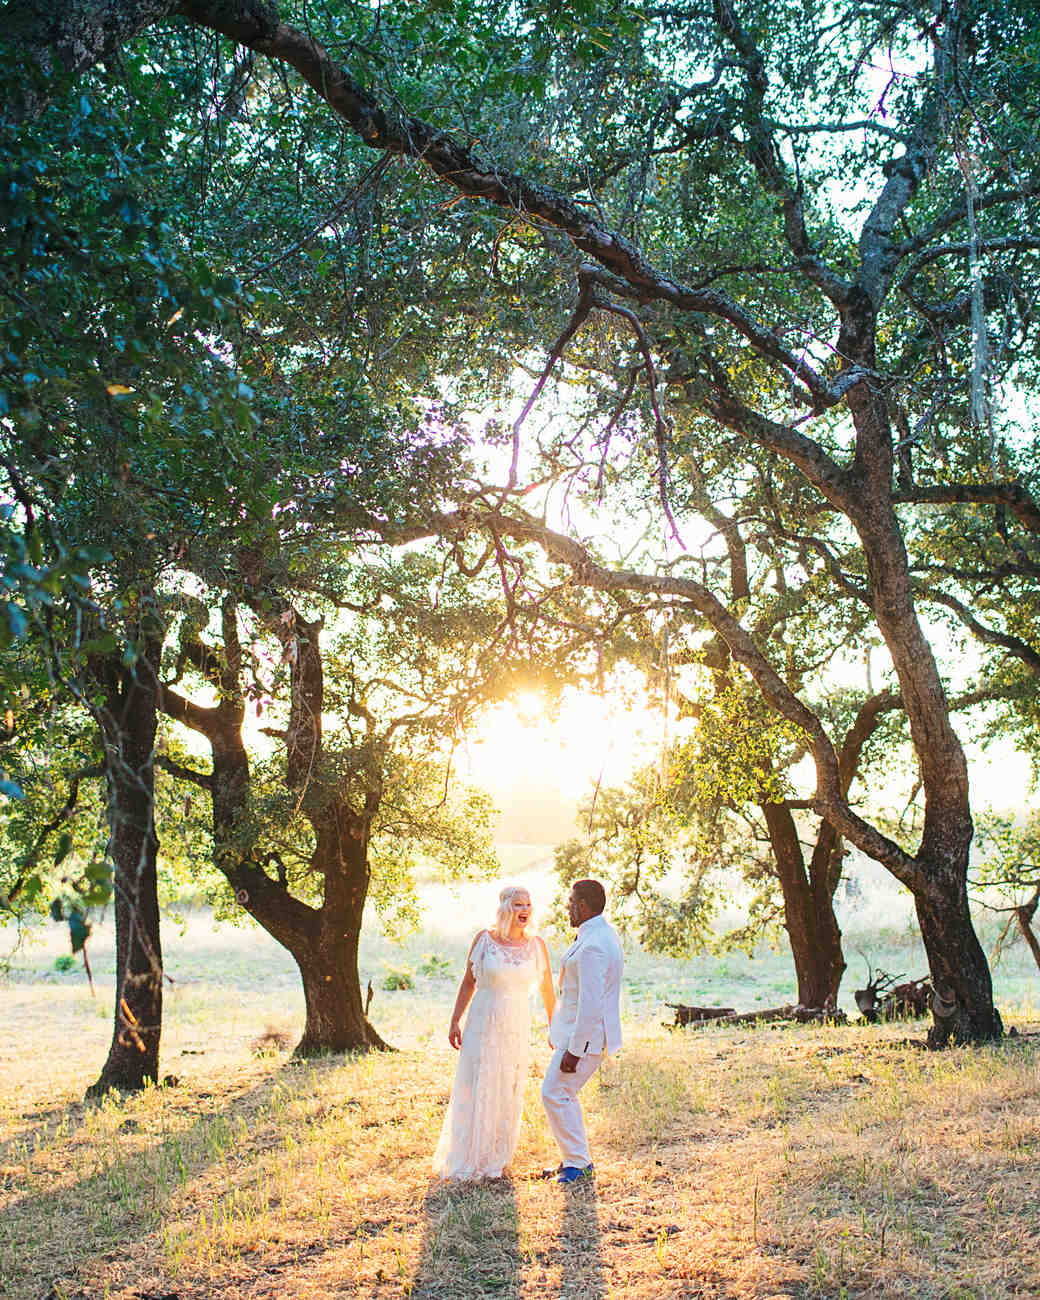 rosie-ambi-wedding-couple-6456-s112501-0116.jpg